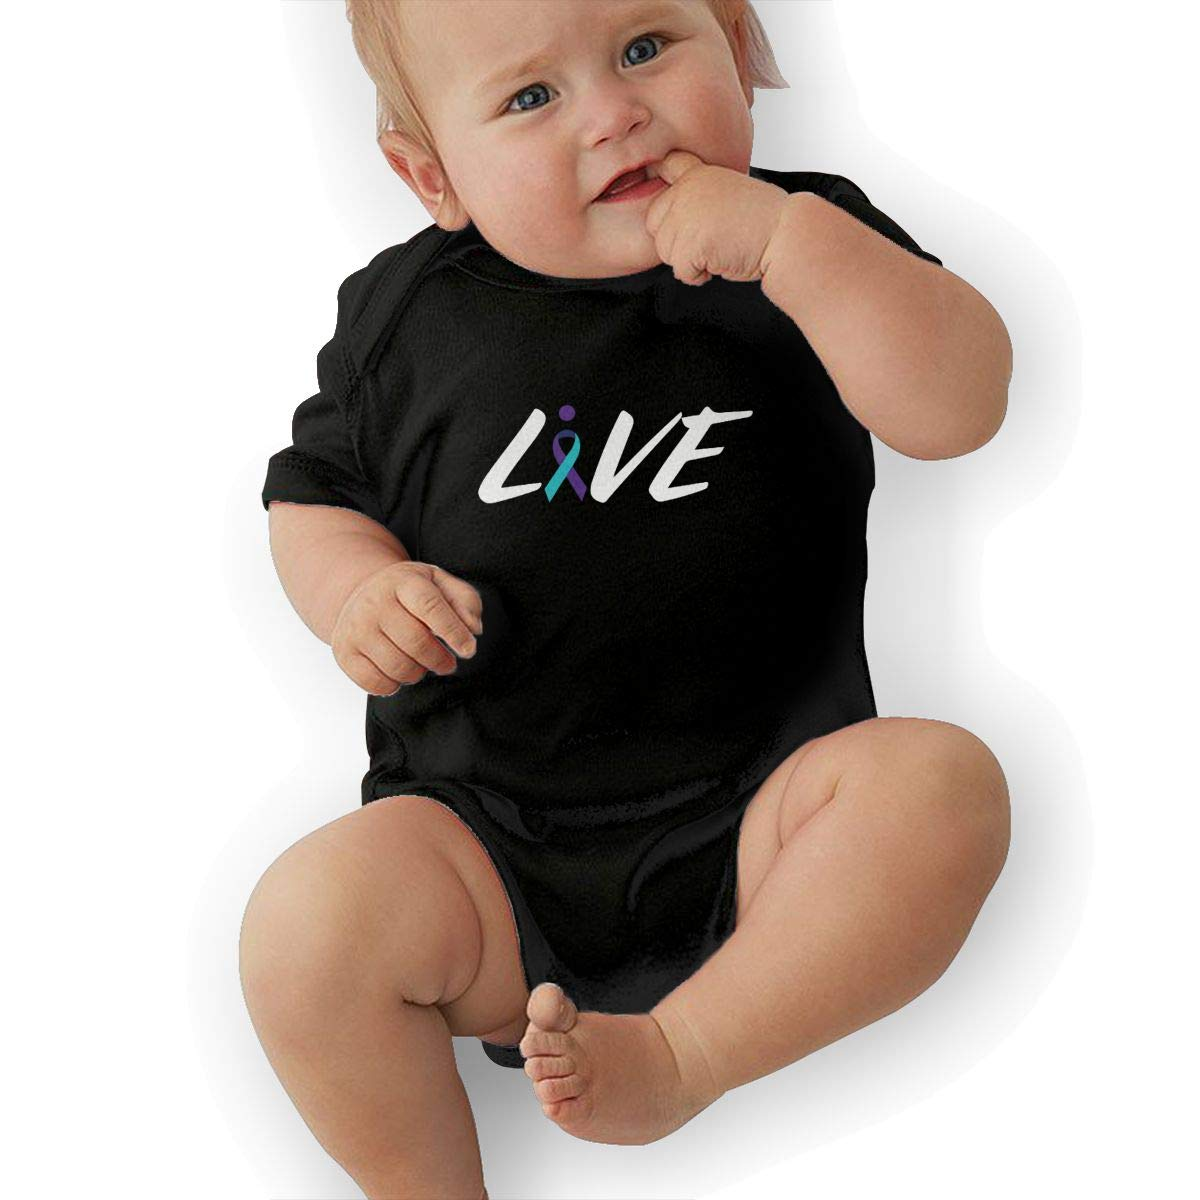 Mri-le2 Newborn Baby Short Sleeve Organic Bodysuits Live Suicide Prevention Awareness-1 Infant Romper Jumpsuit